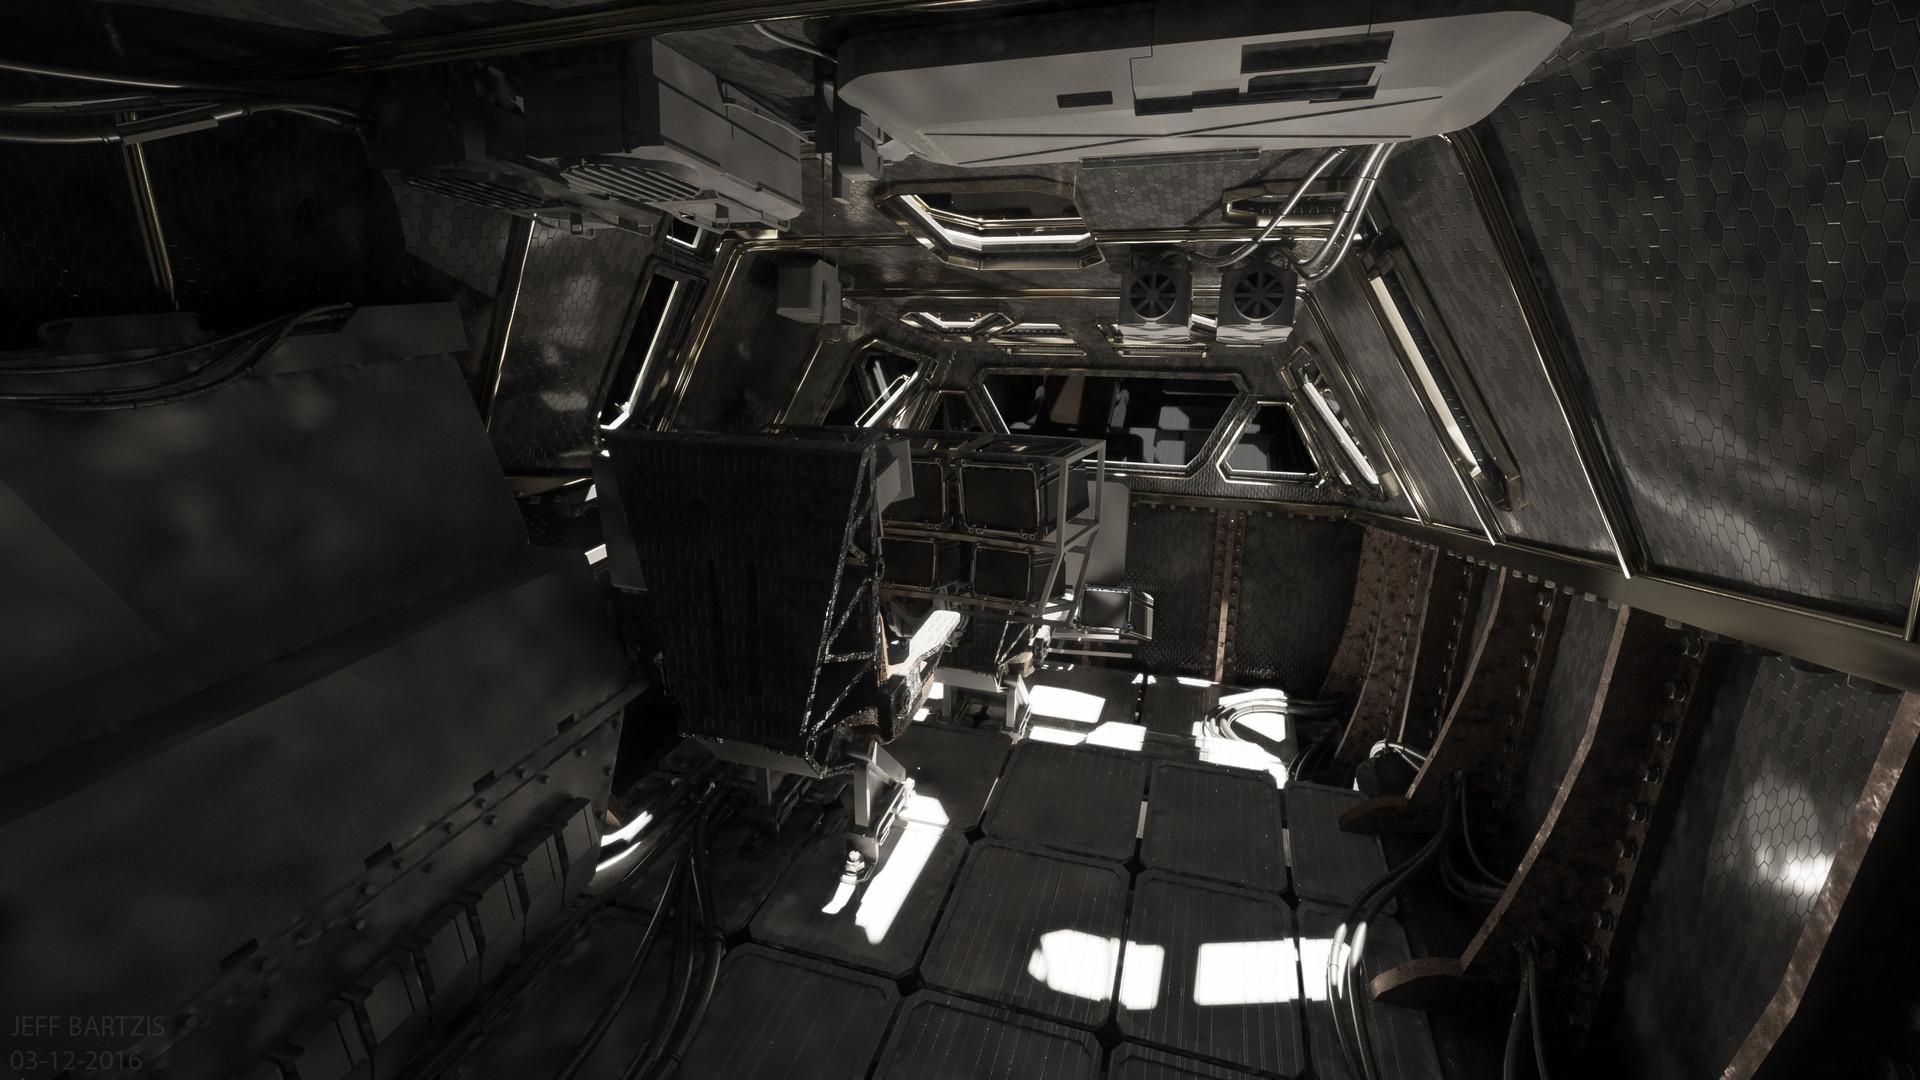 Jeff bartzis cockpit concept 04 rawrender